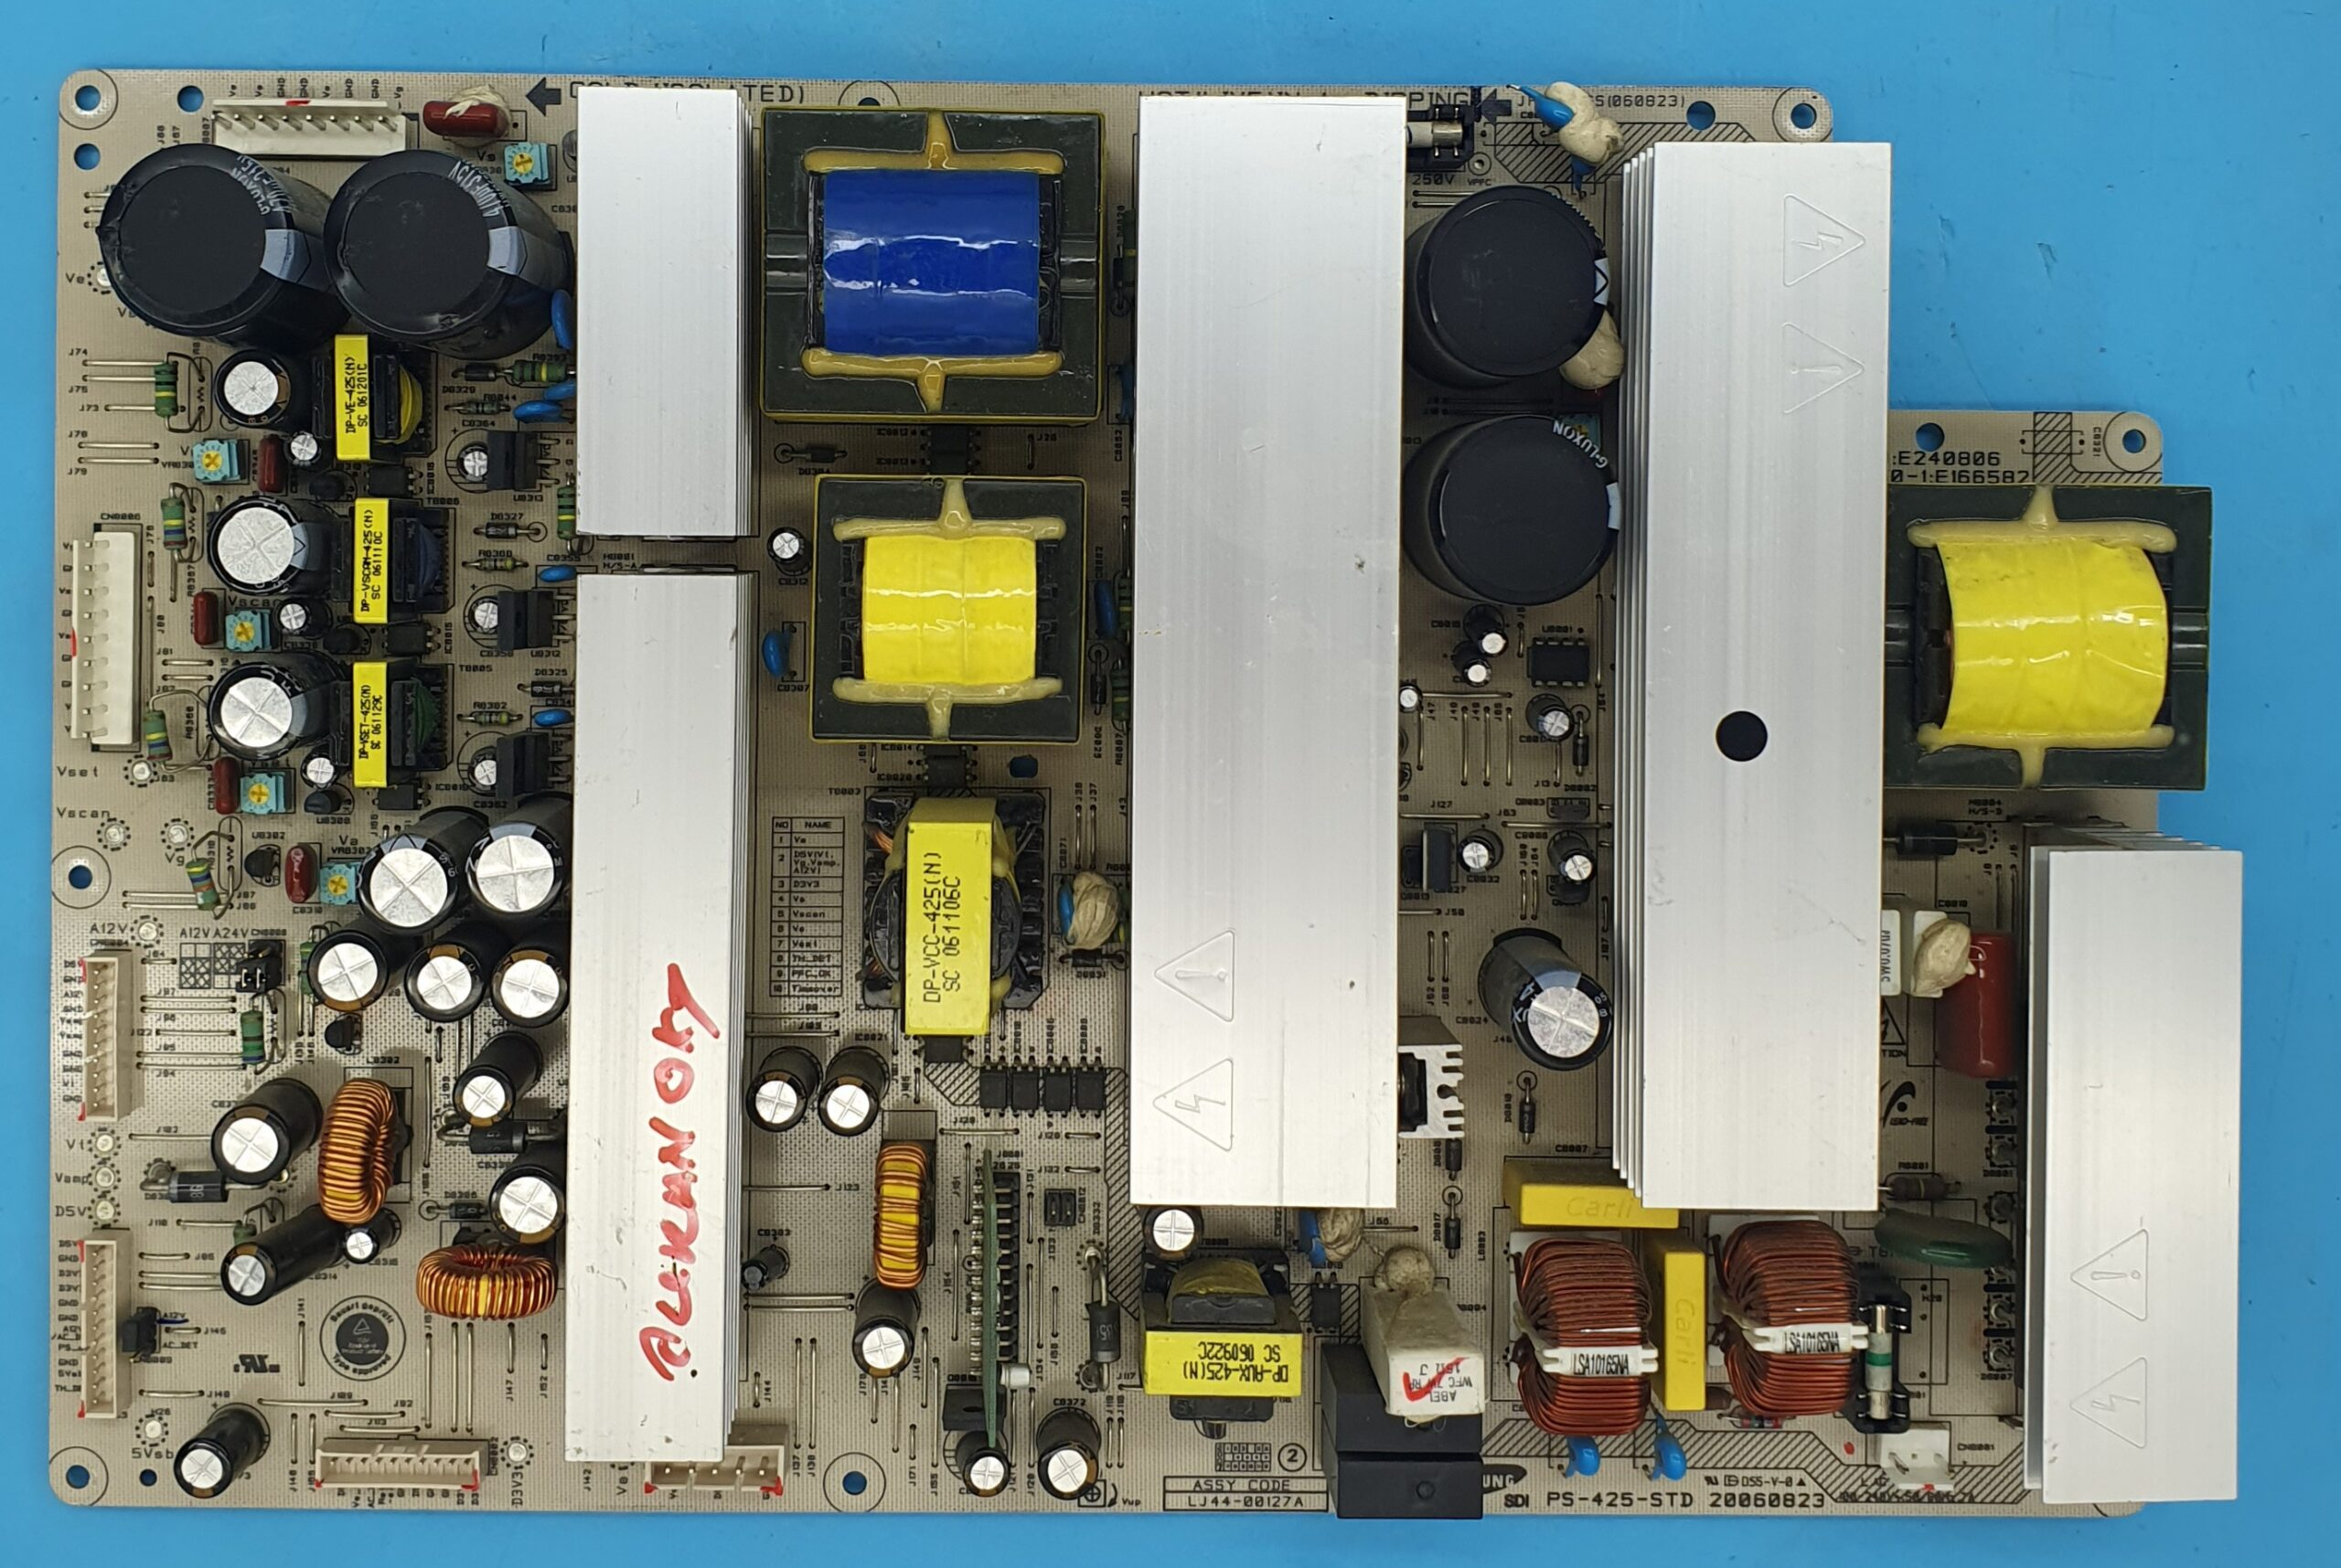 PS-425-STD Samsung Power (KDV DAHİL = 150 TL)